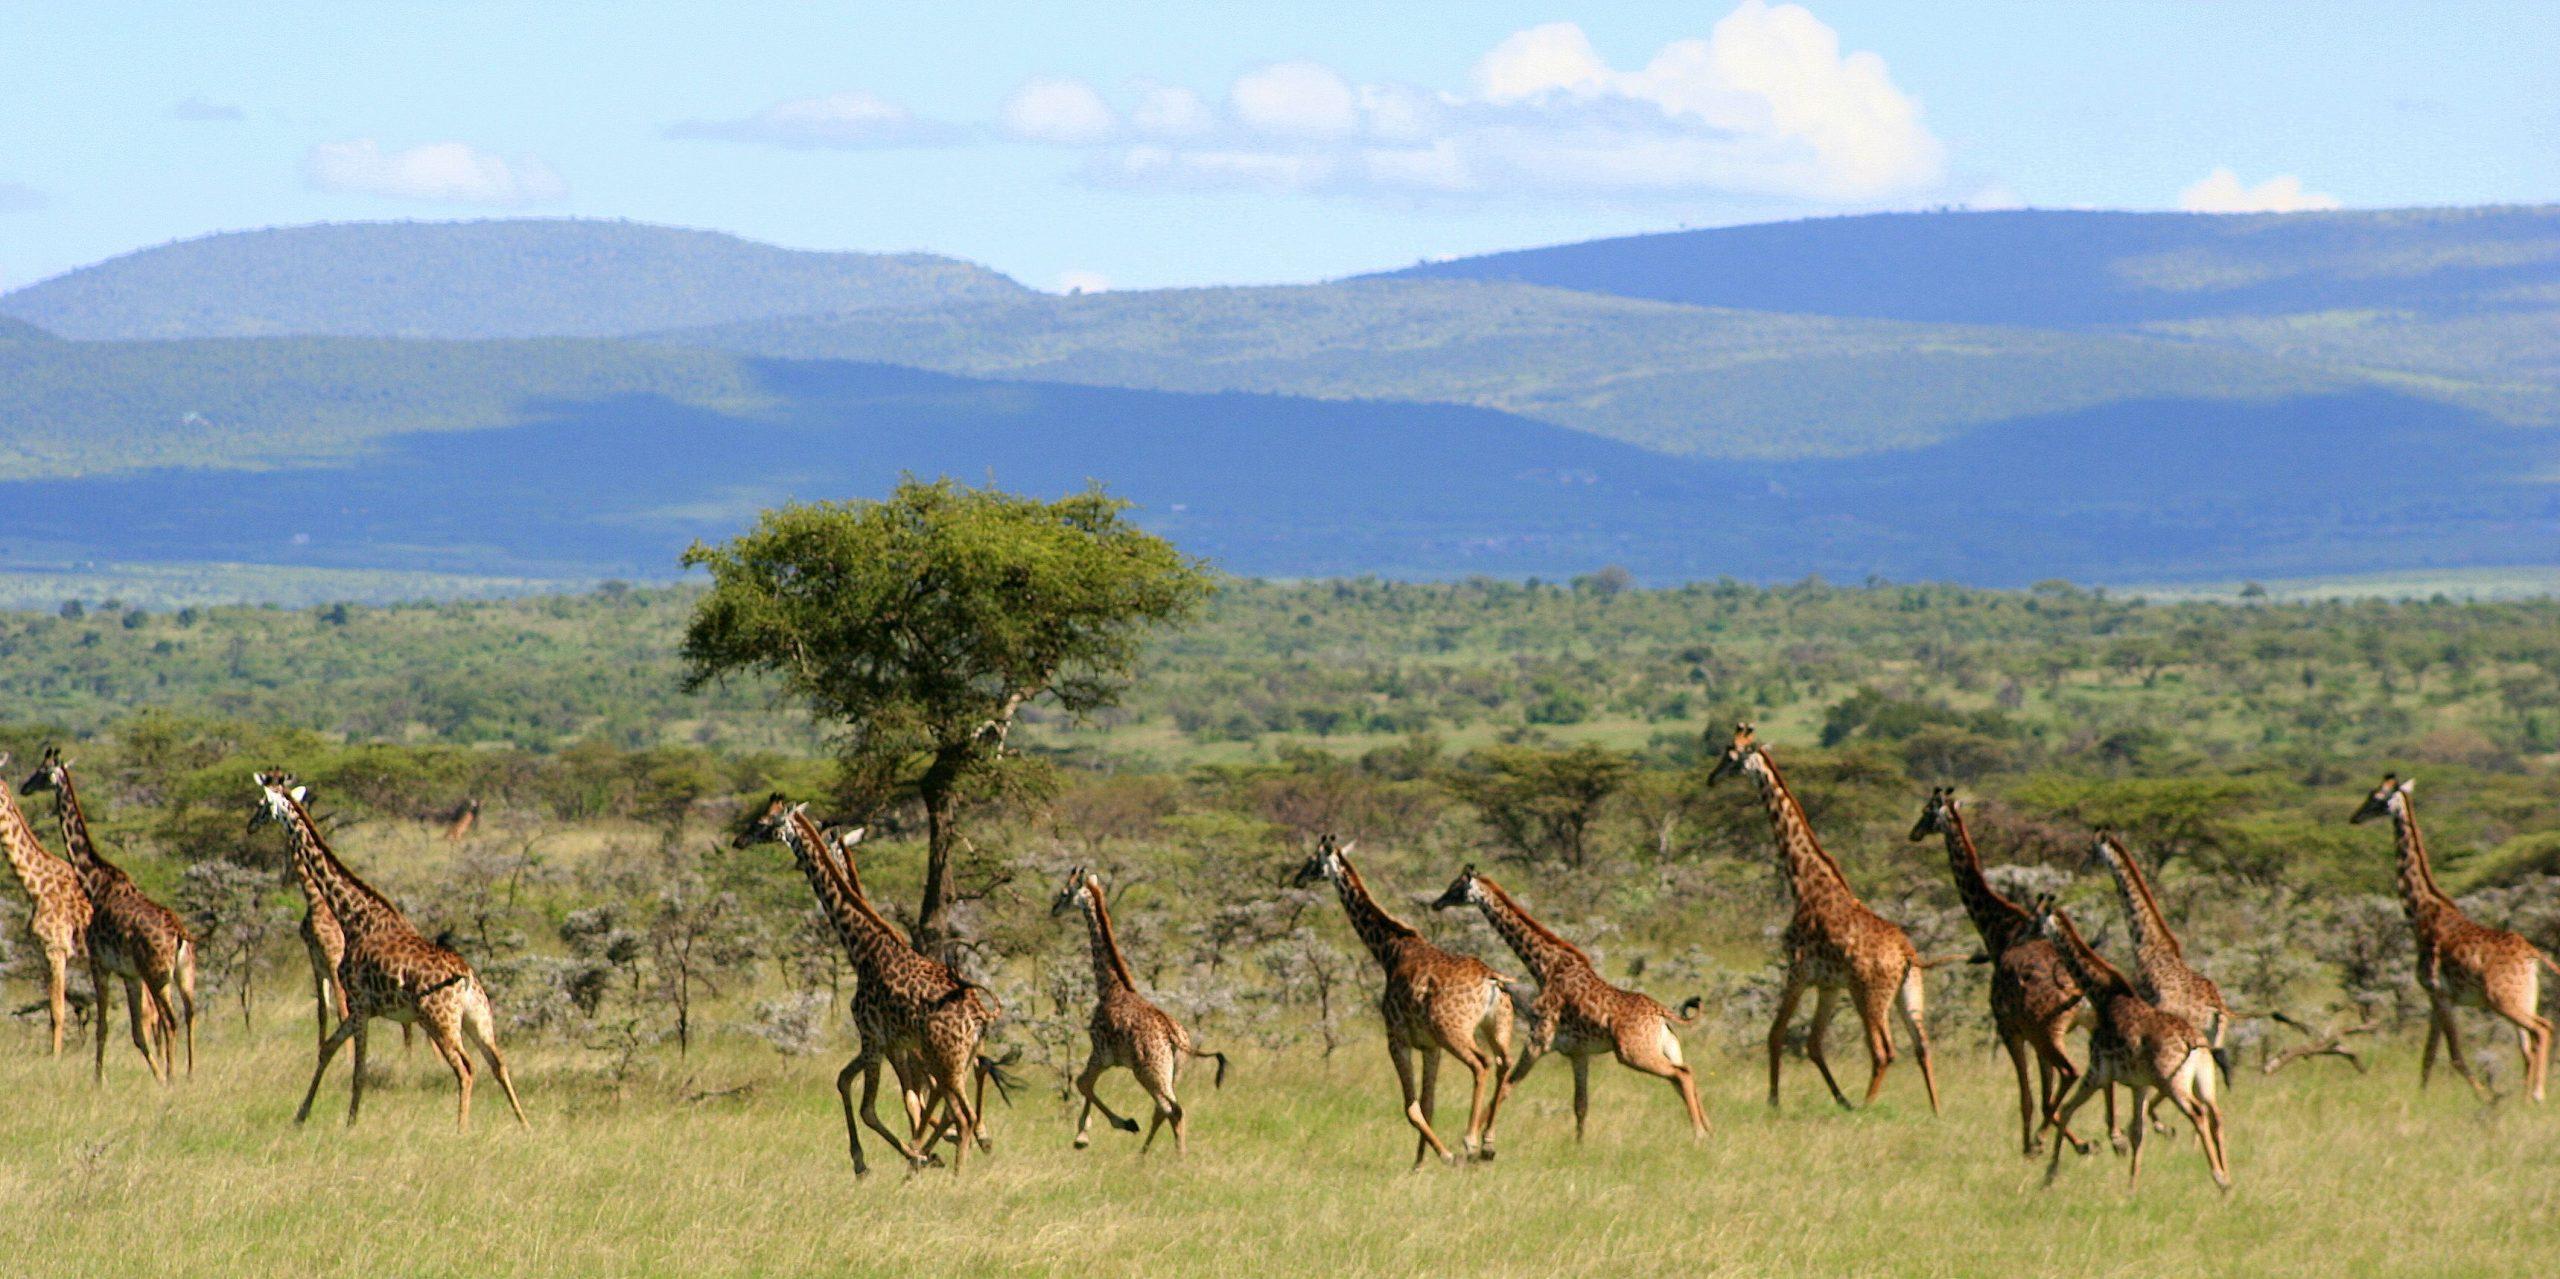 Giraffes at Encounter Mara - Asilia